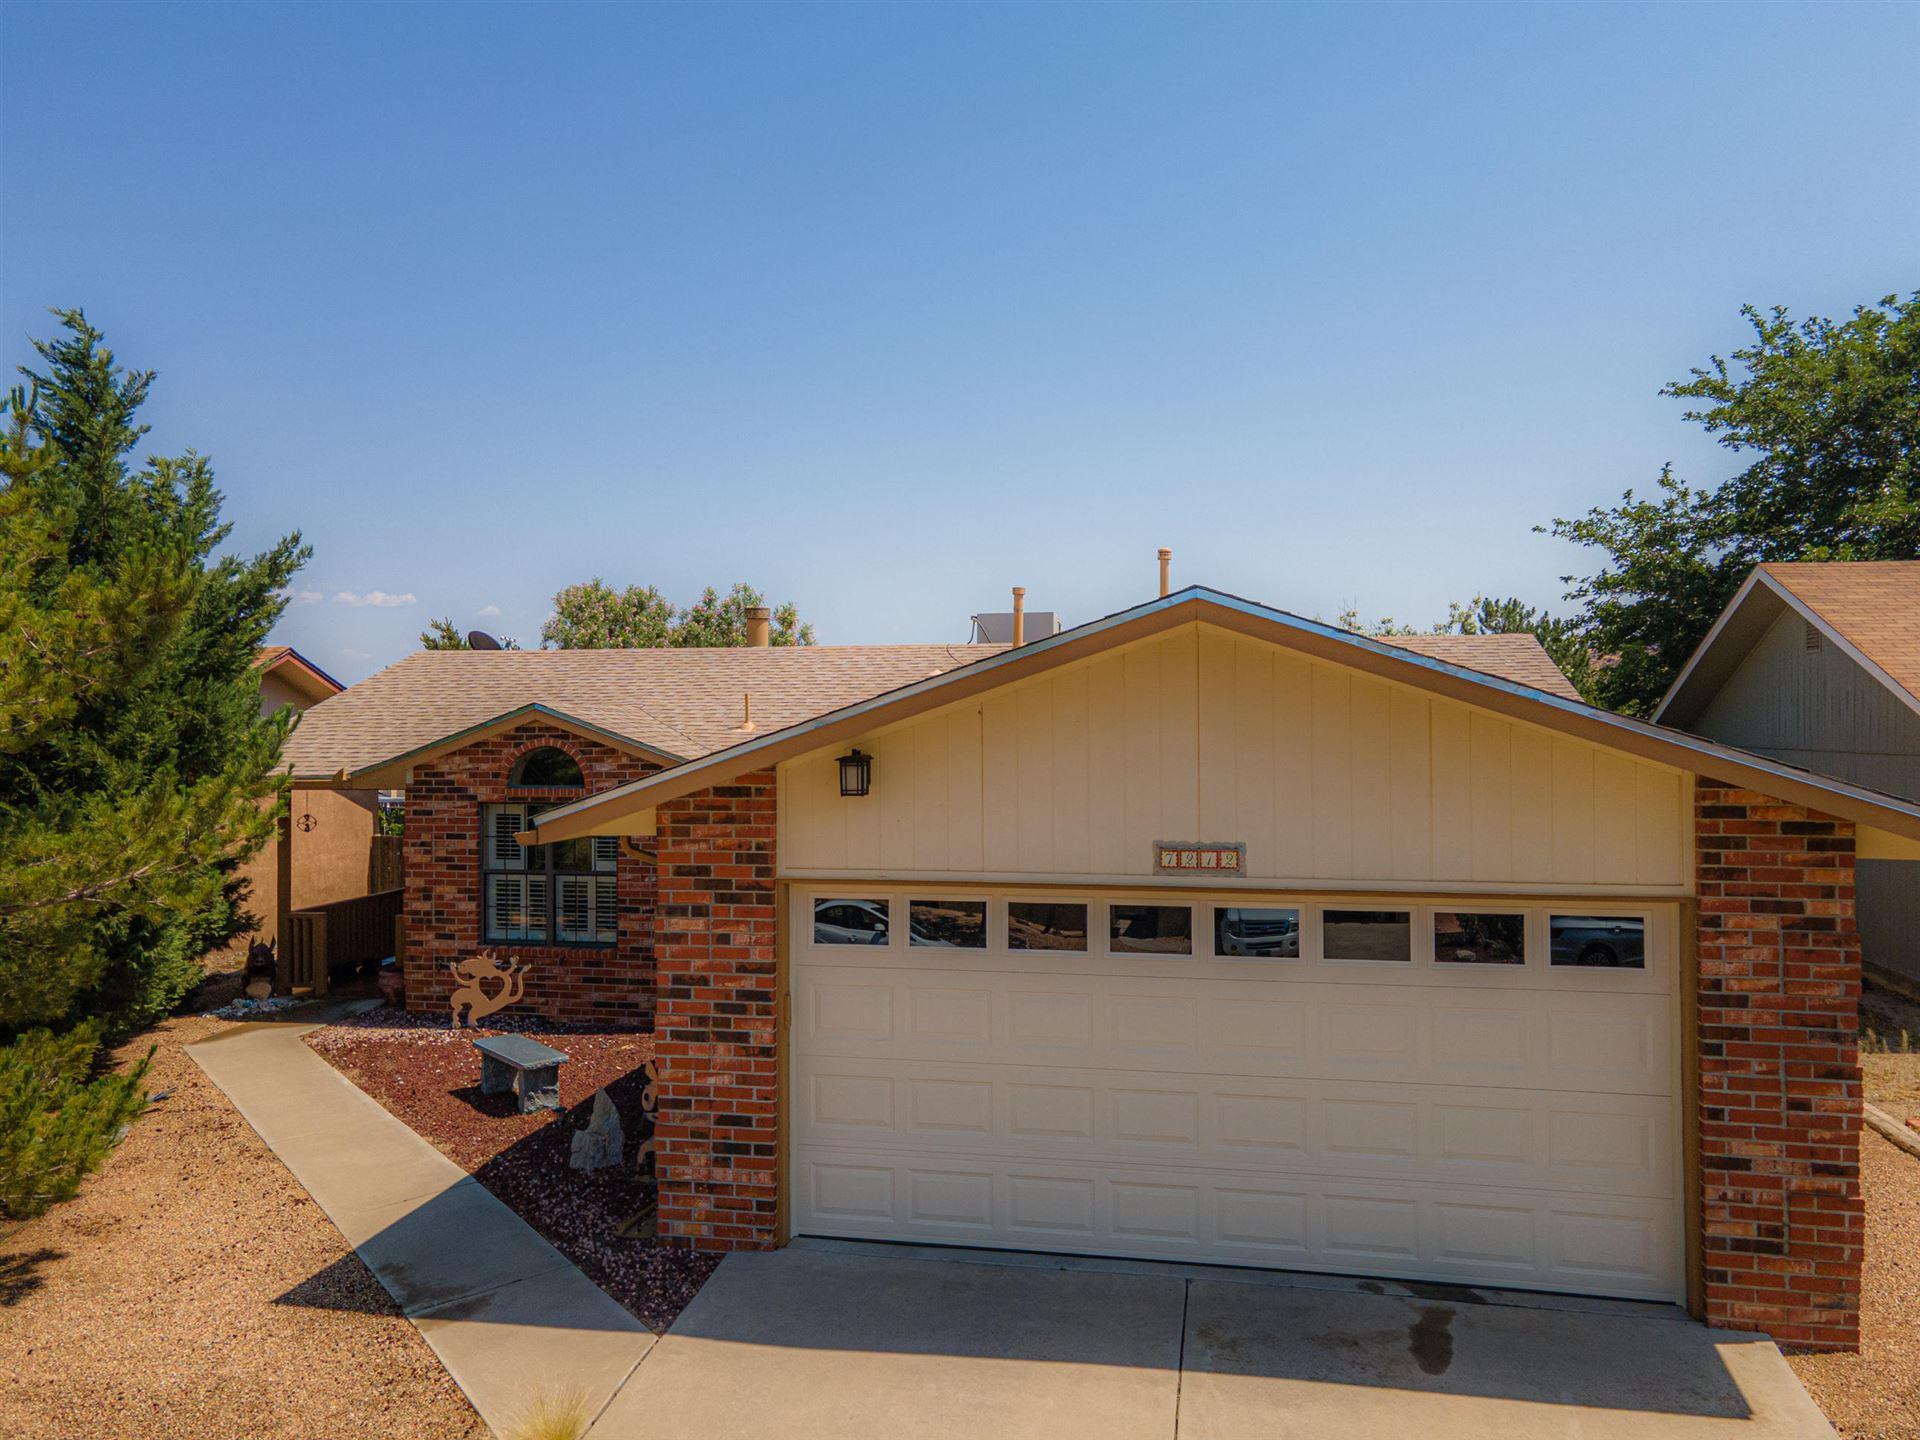 Photo of 7212 MINEHEAD Street NW, Albuquerque, NM 87120 (MLS # 994587)